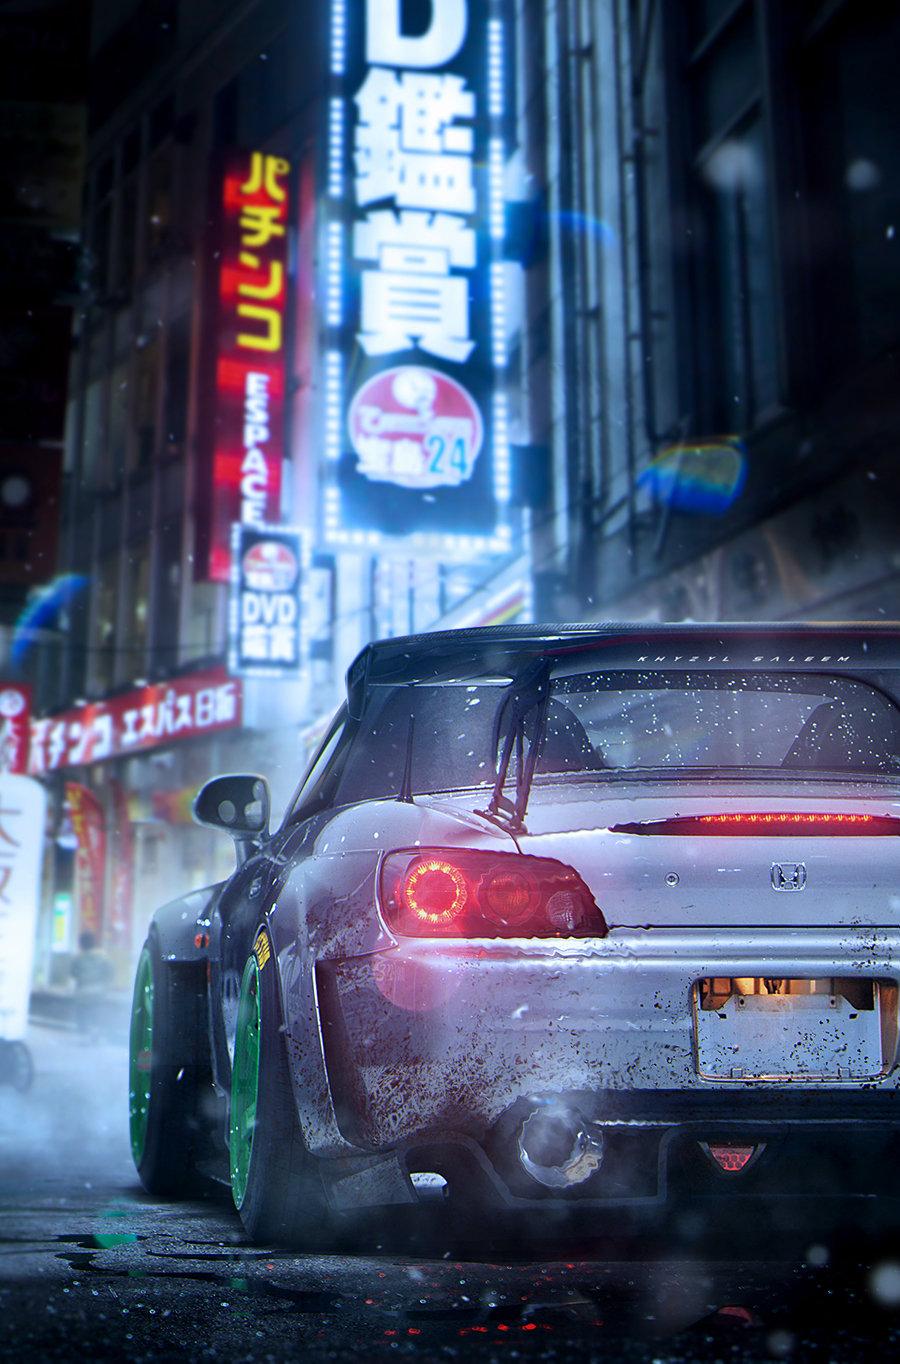 Hd Jdm Car Wallpapers Khyzyl Saleem Honda S2000 Wallpaper